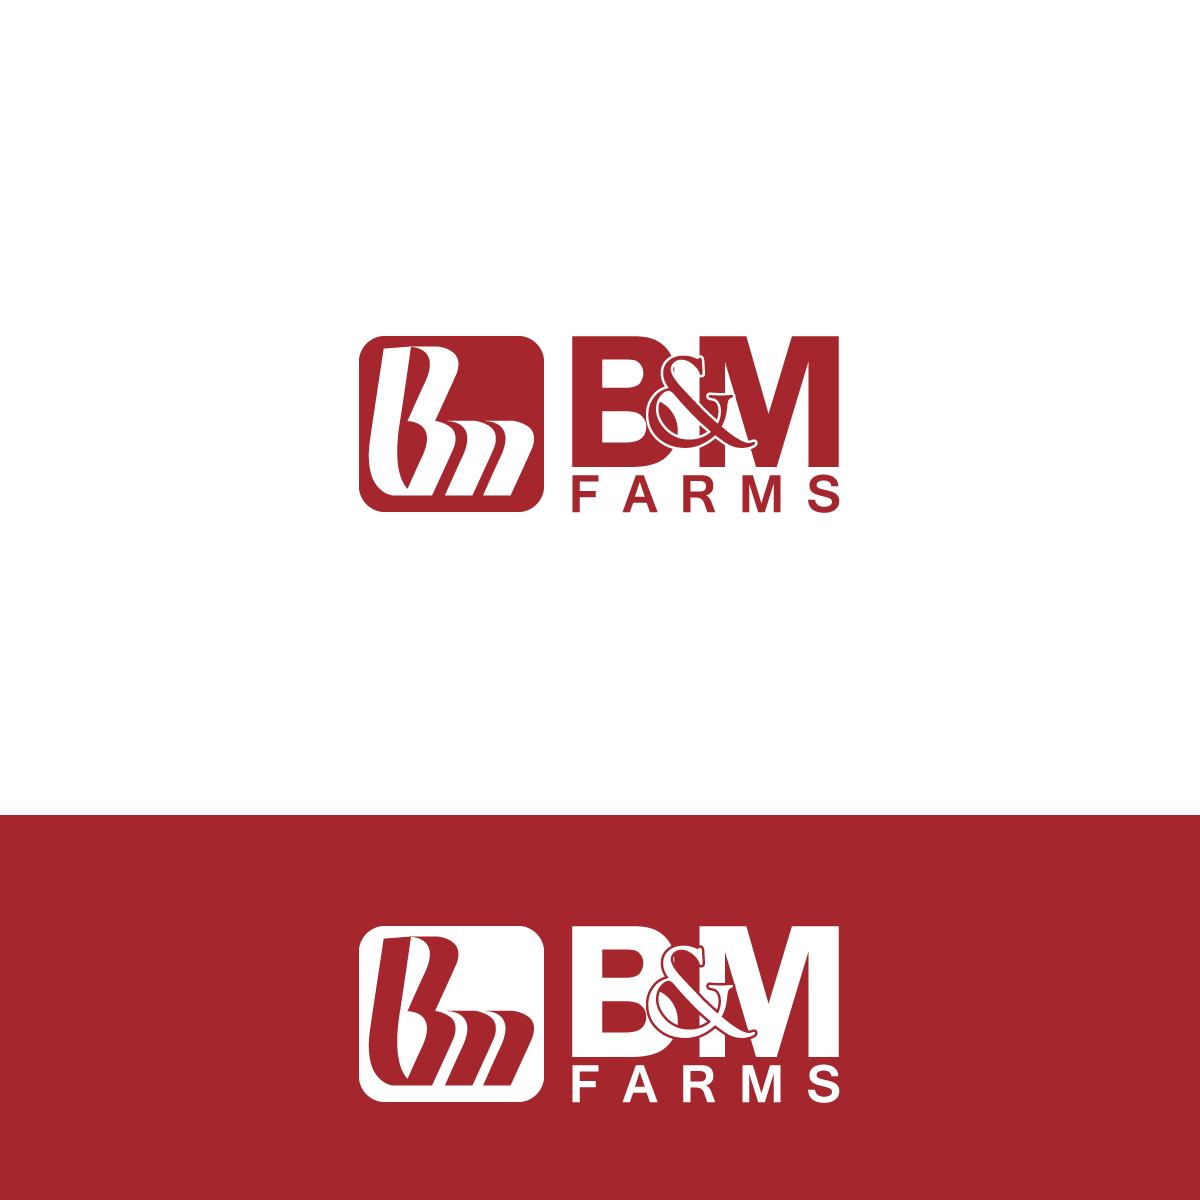 Logo Design by rockin - Entry No. 4 in the Logo Design Contest Creative Logo Design for B & M Farms, LLC.